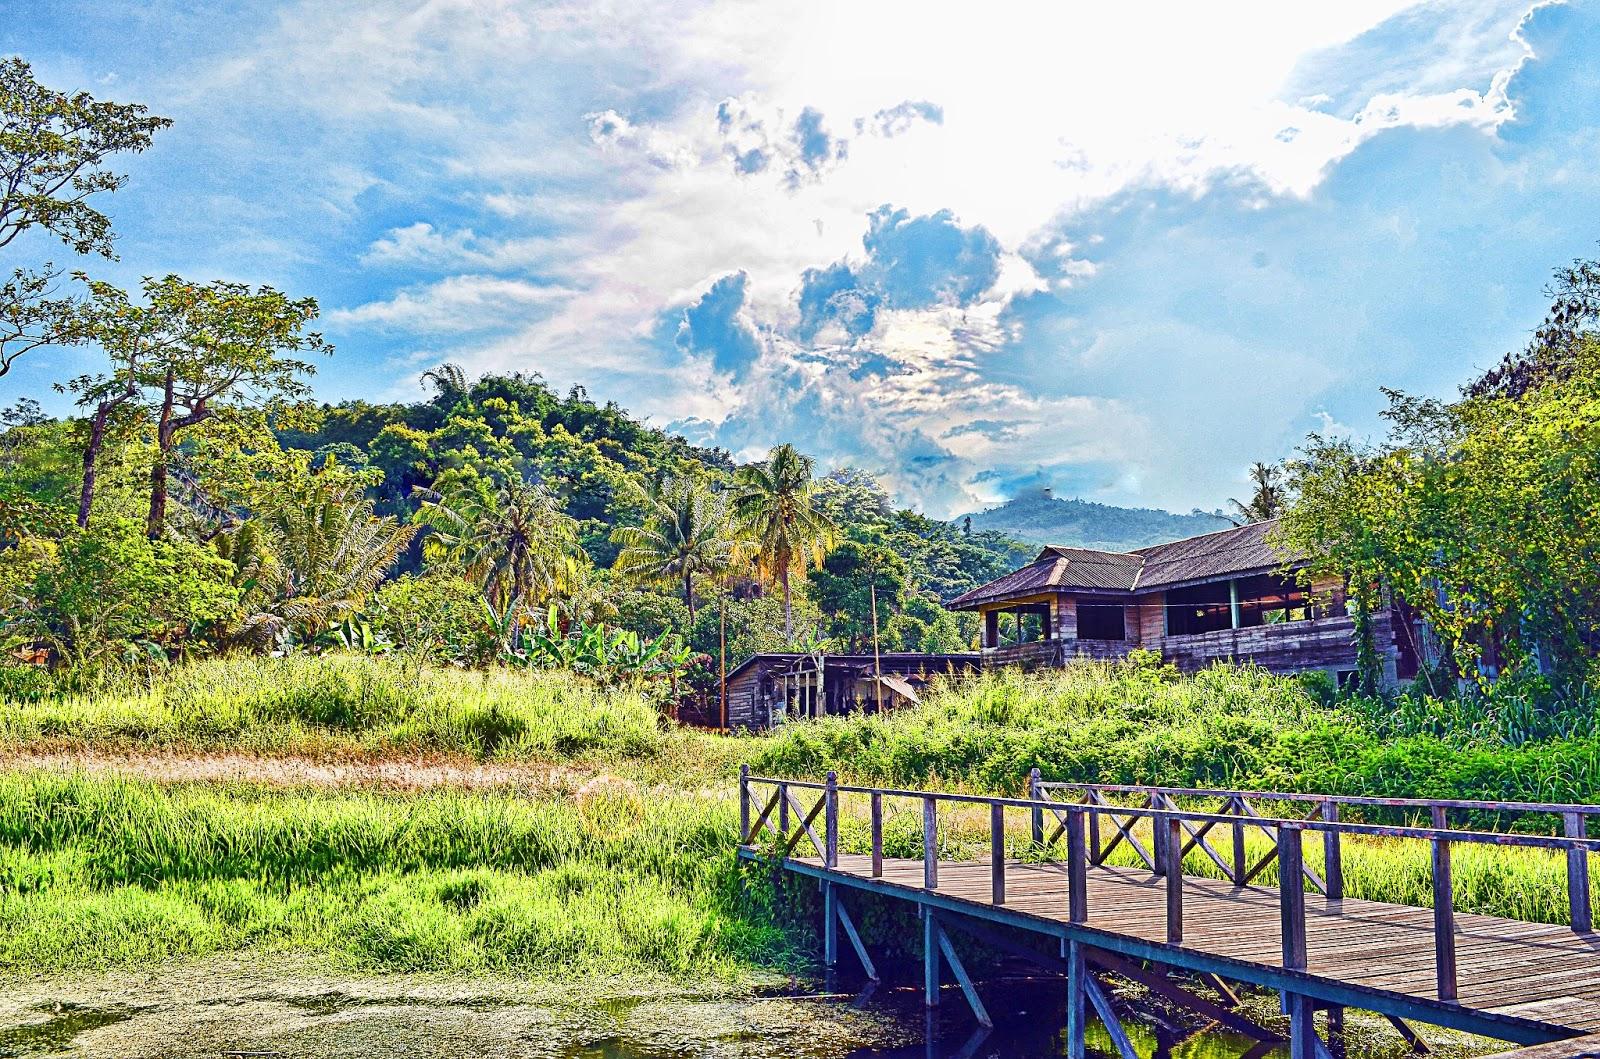 gambar pemandangan kampung - photo #2